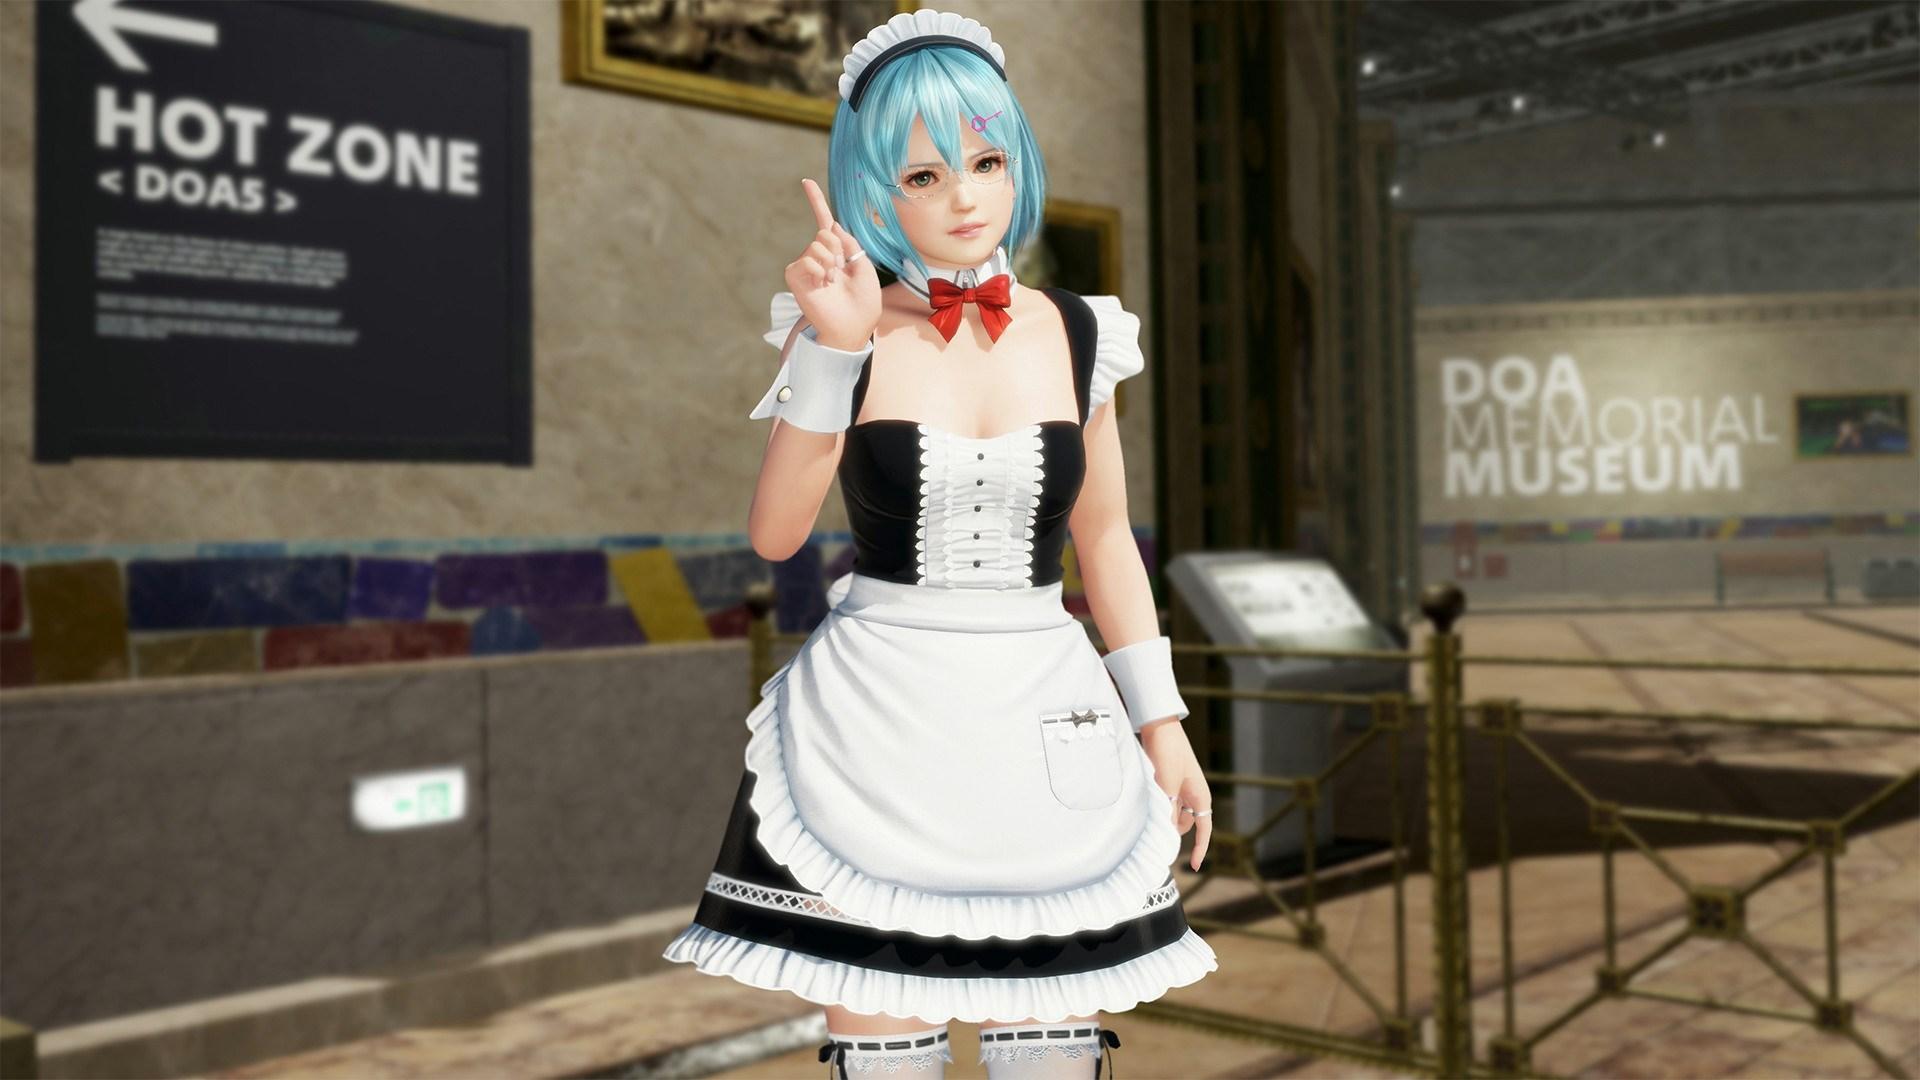 [Revival] DOA6 Maid Costume - NiCO